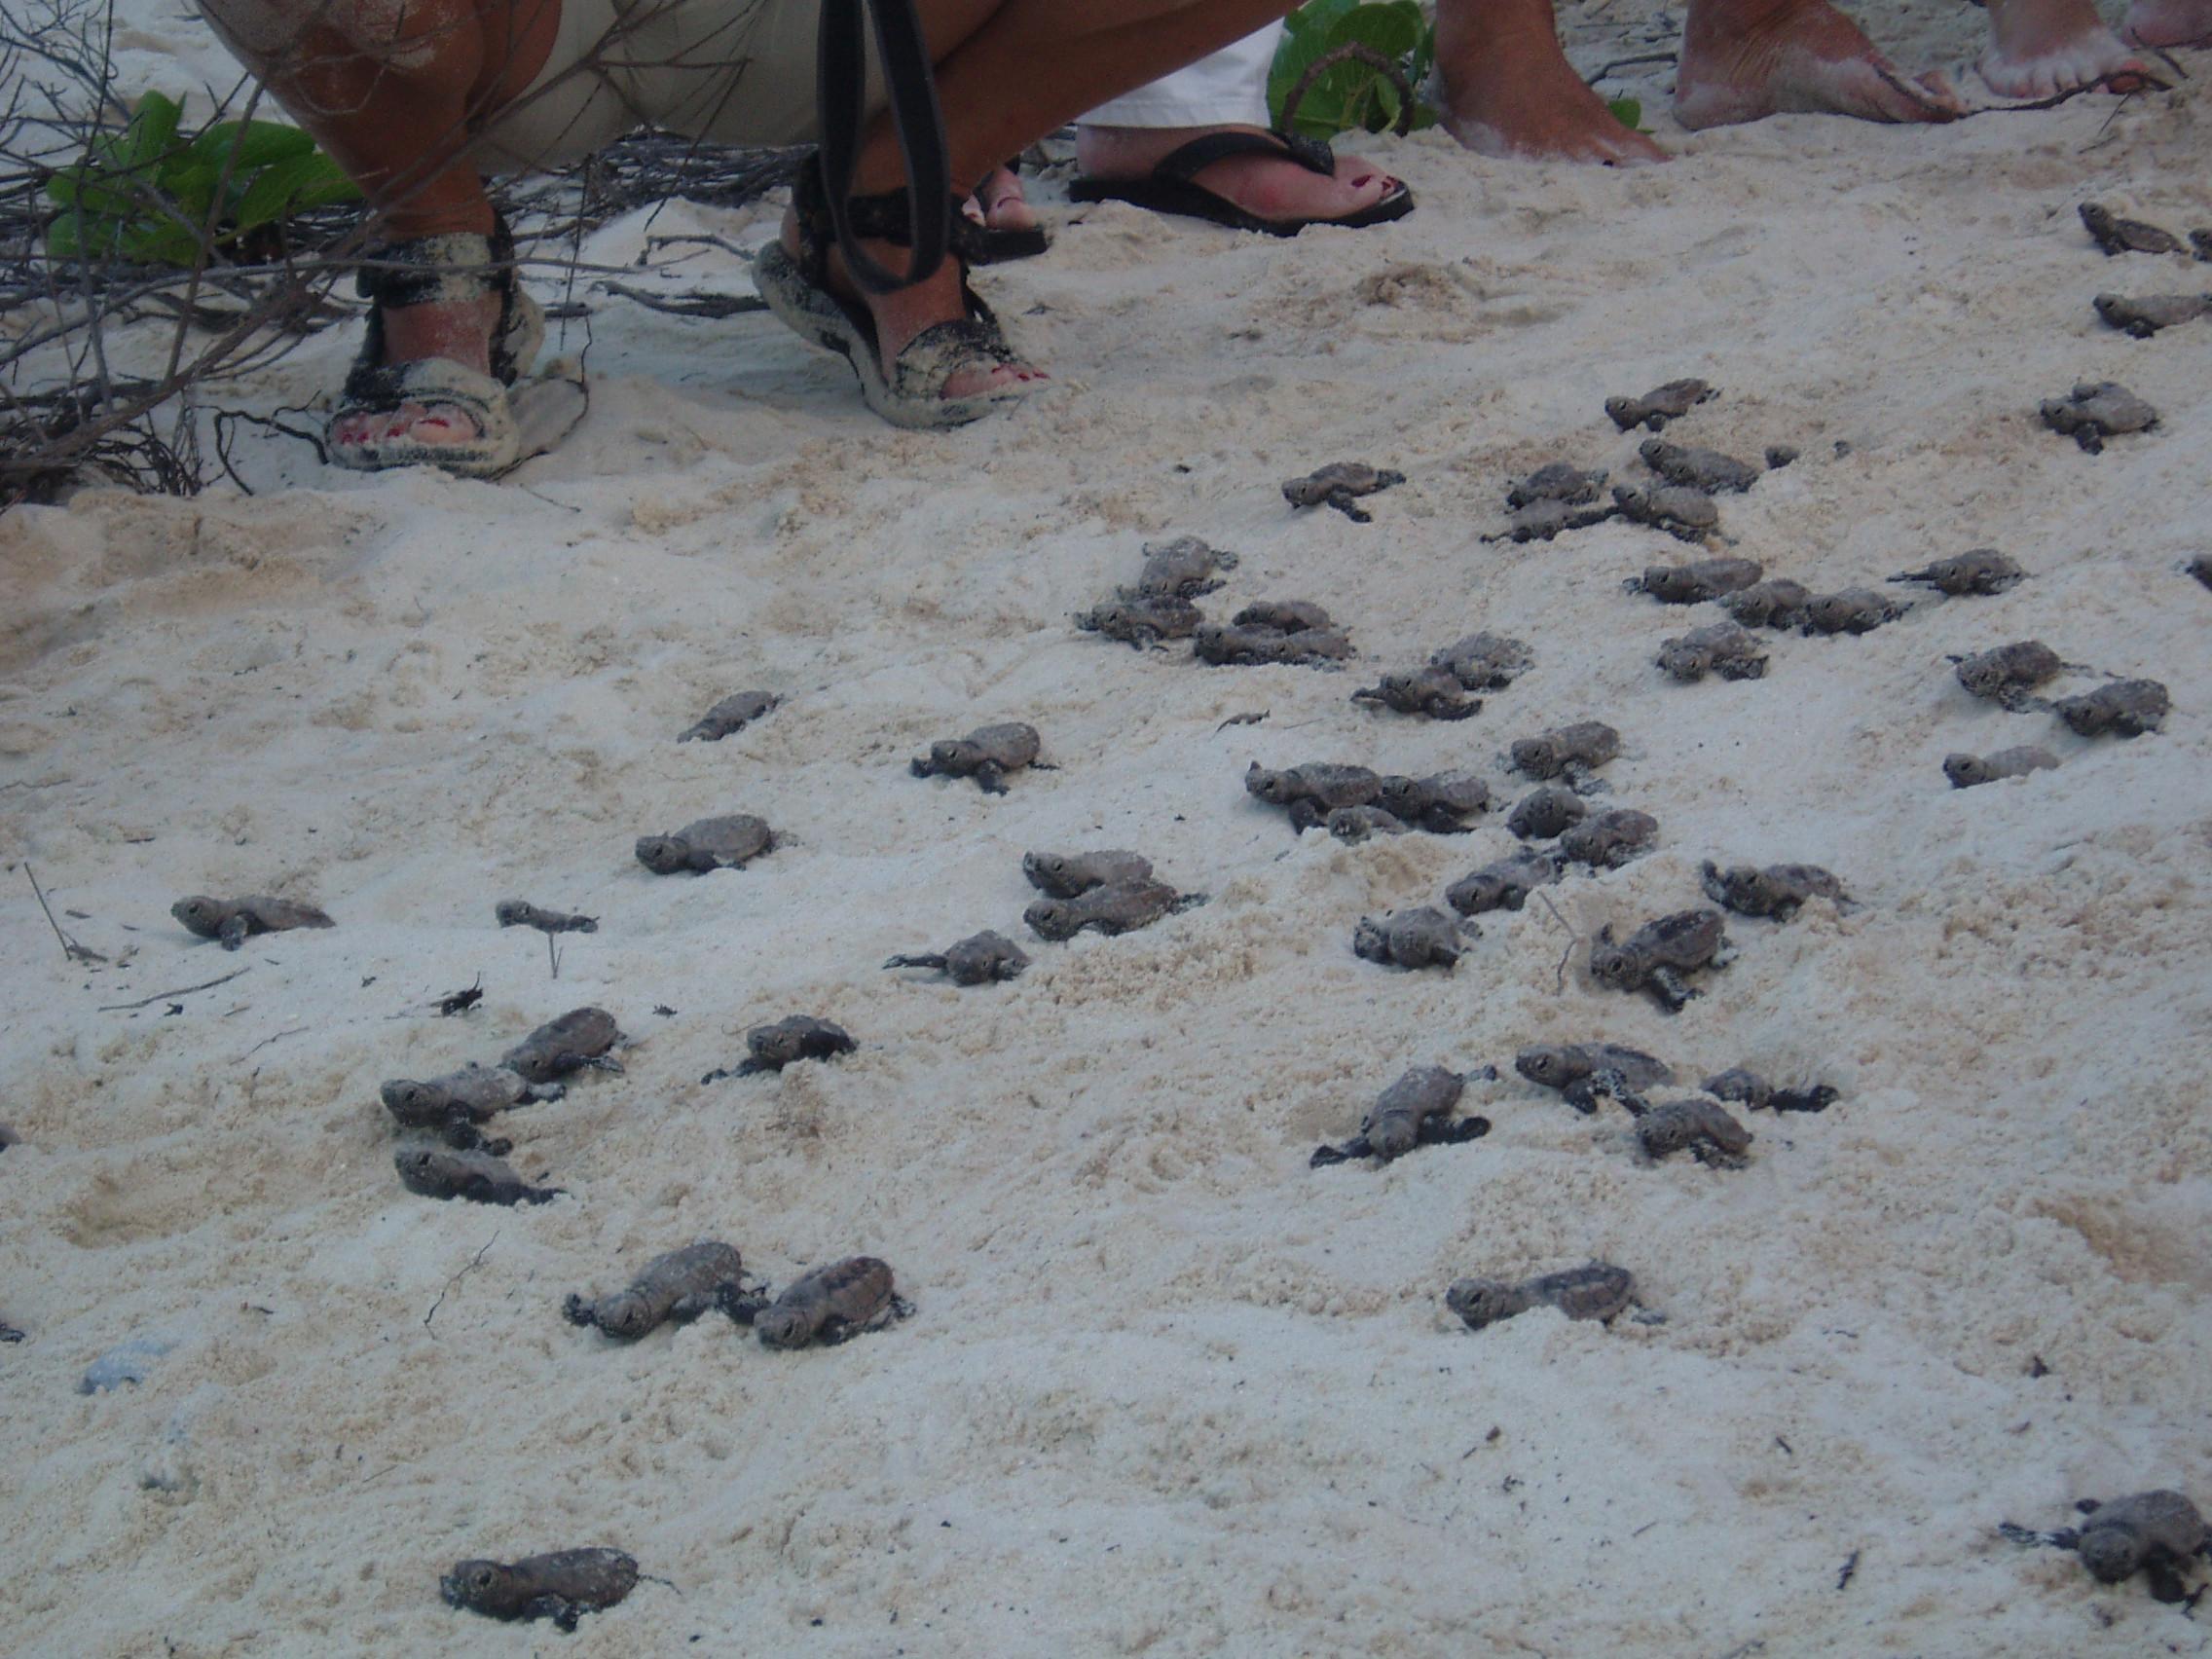 Turtles Hatching at Klein Bonaire